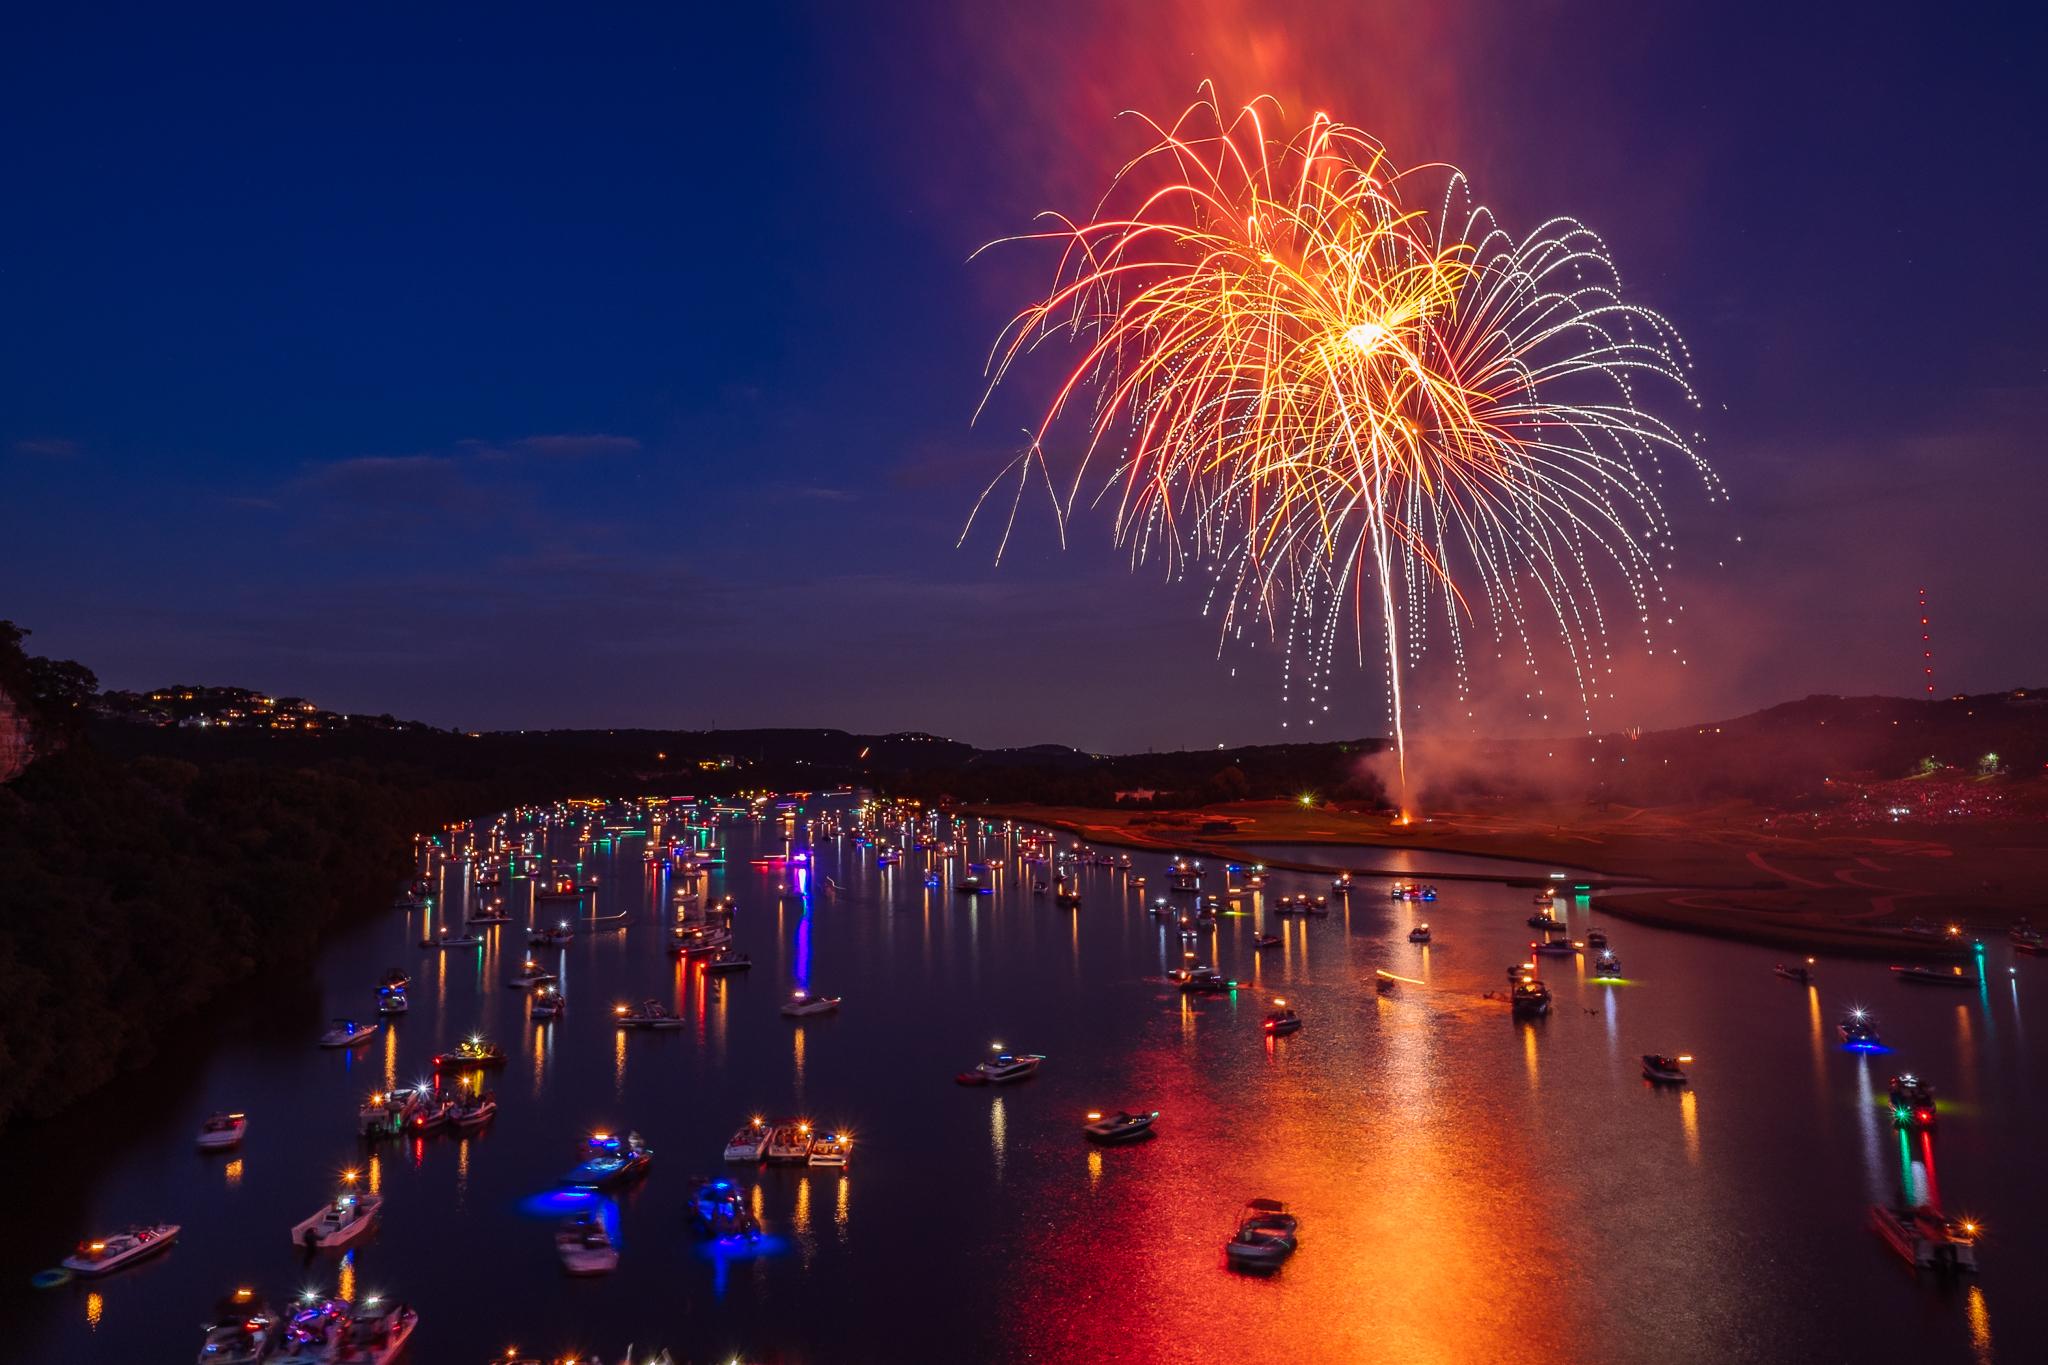 austin_fireworks_2014_8.jpg